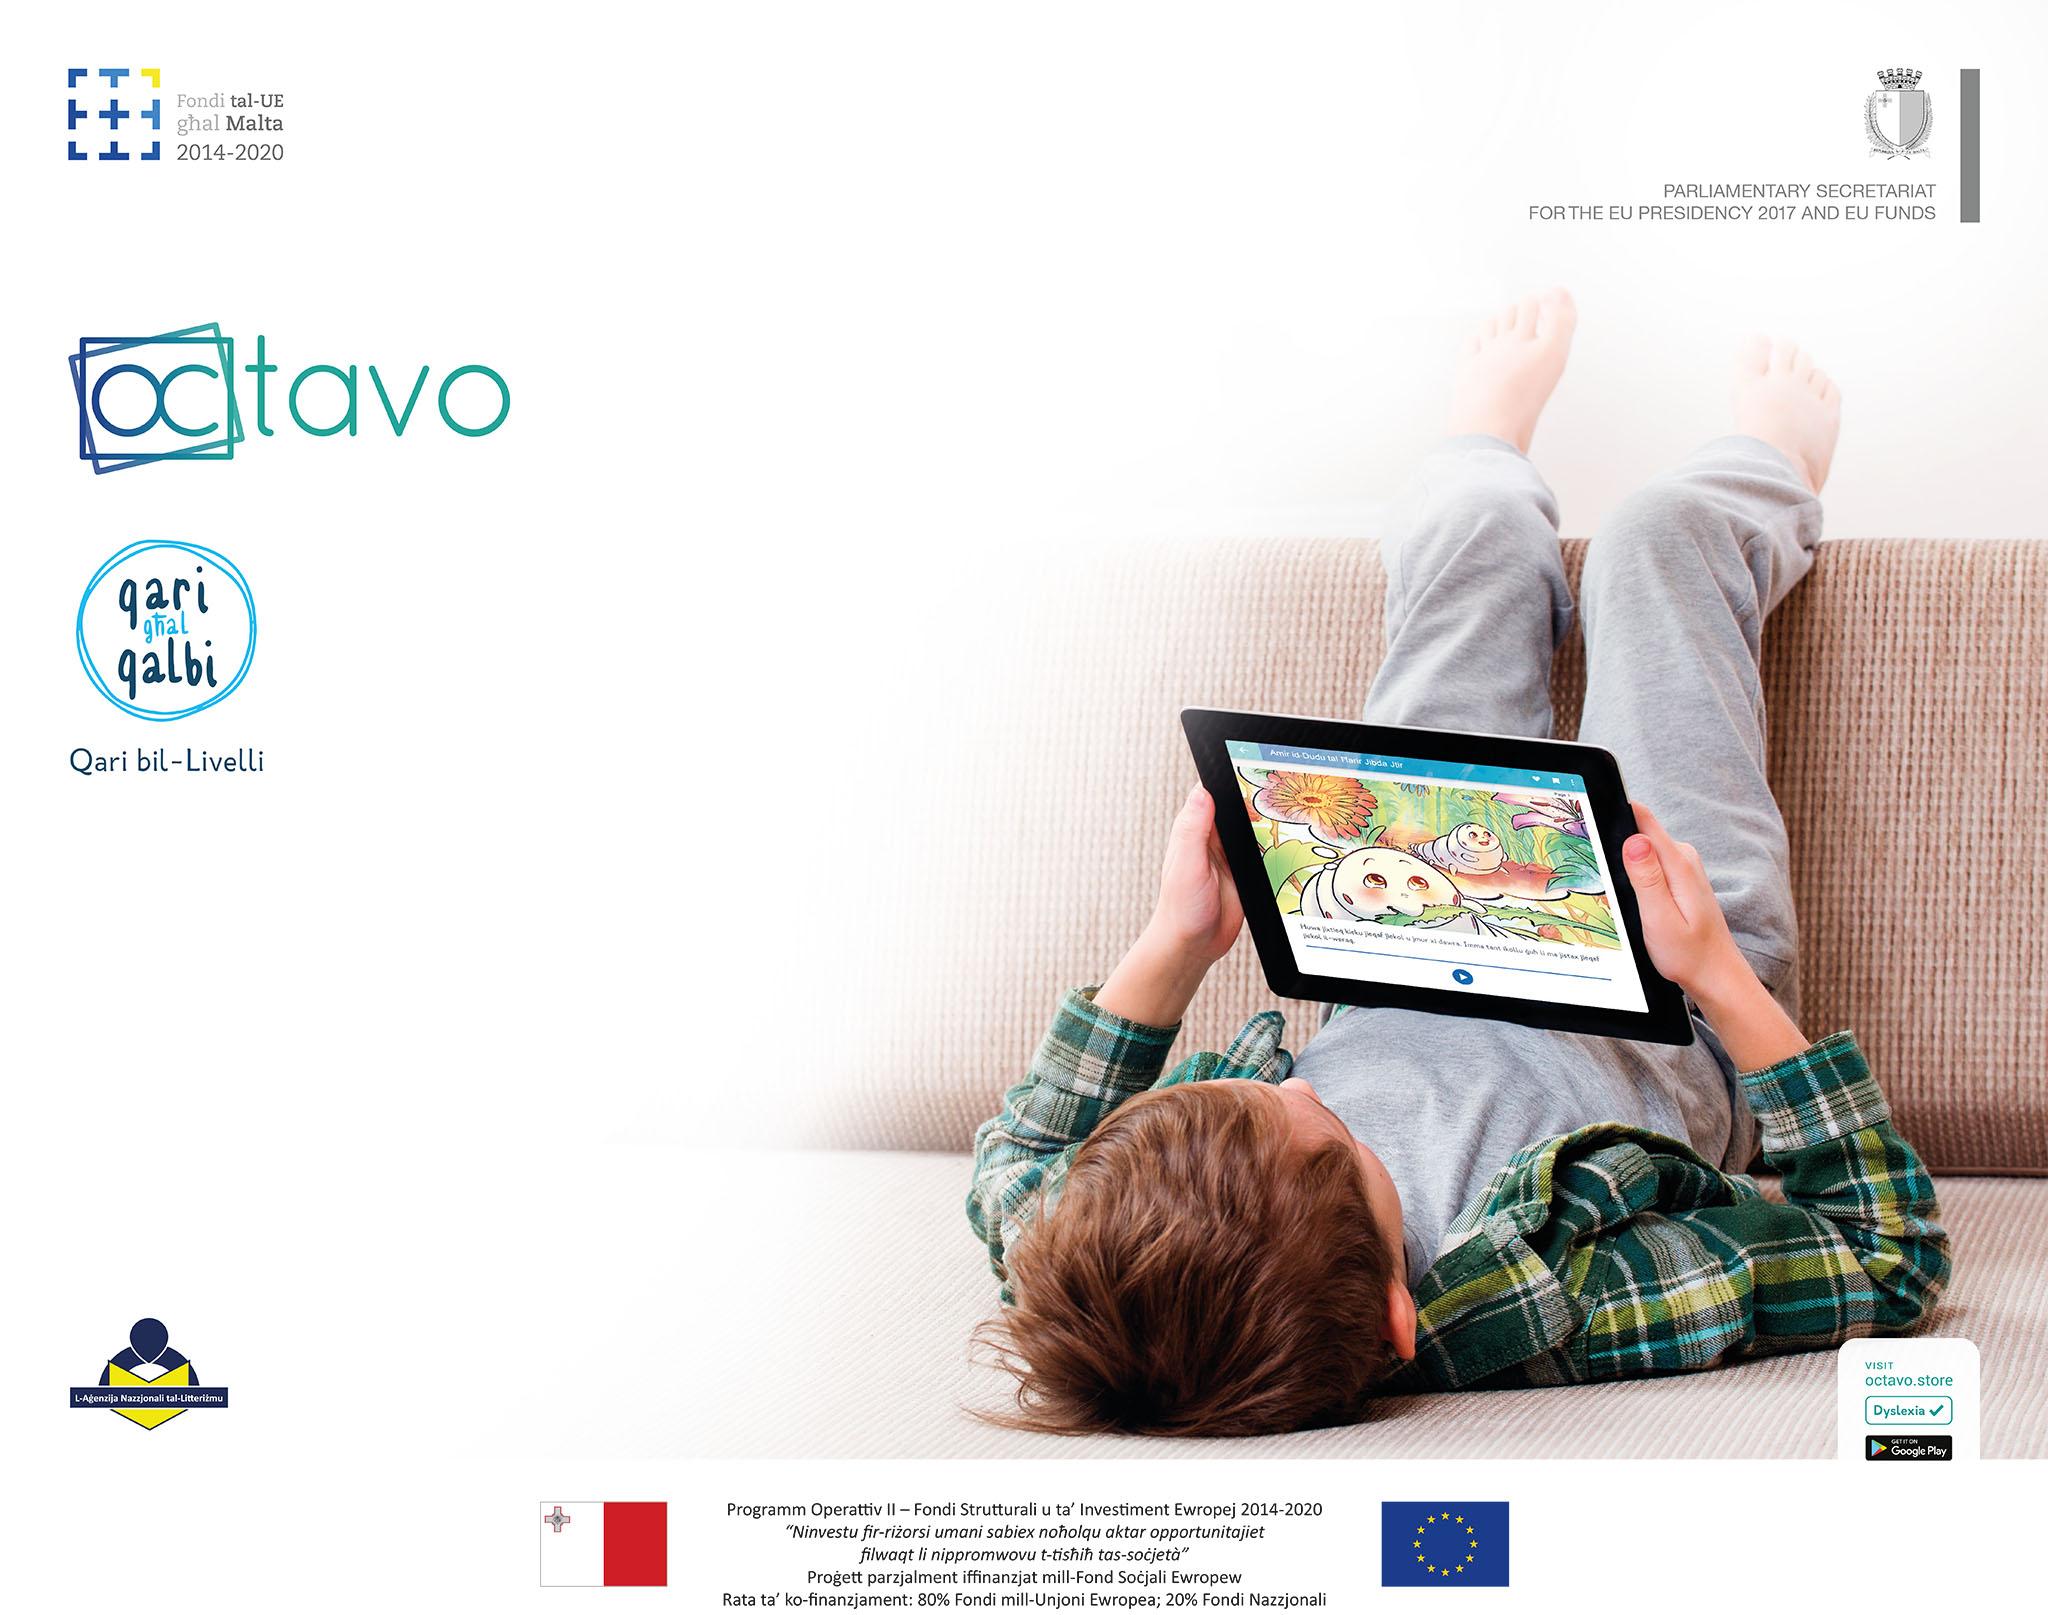 Octavo NLA poster